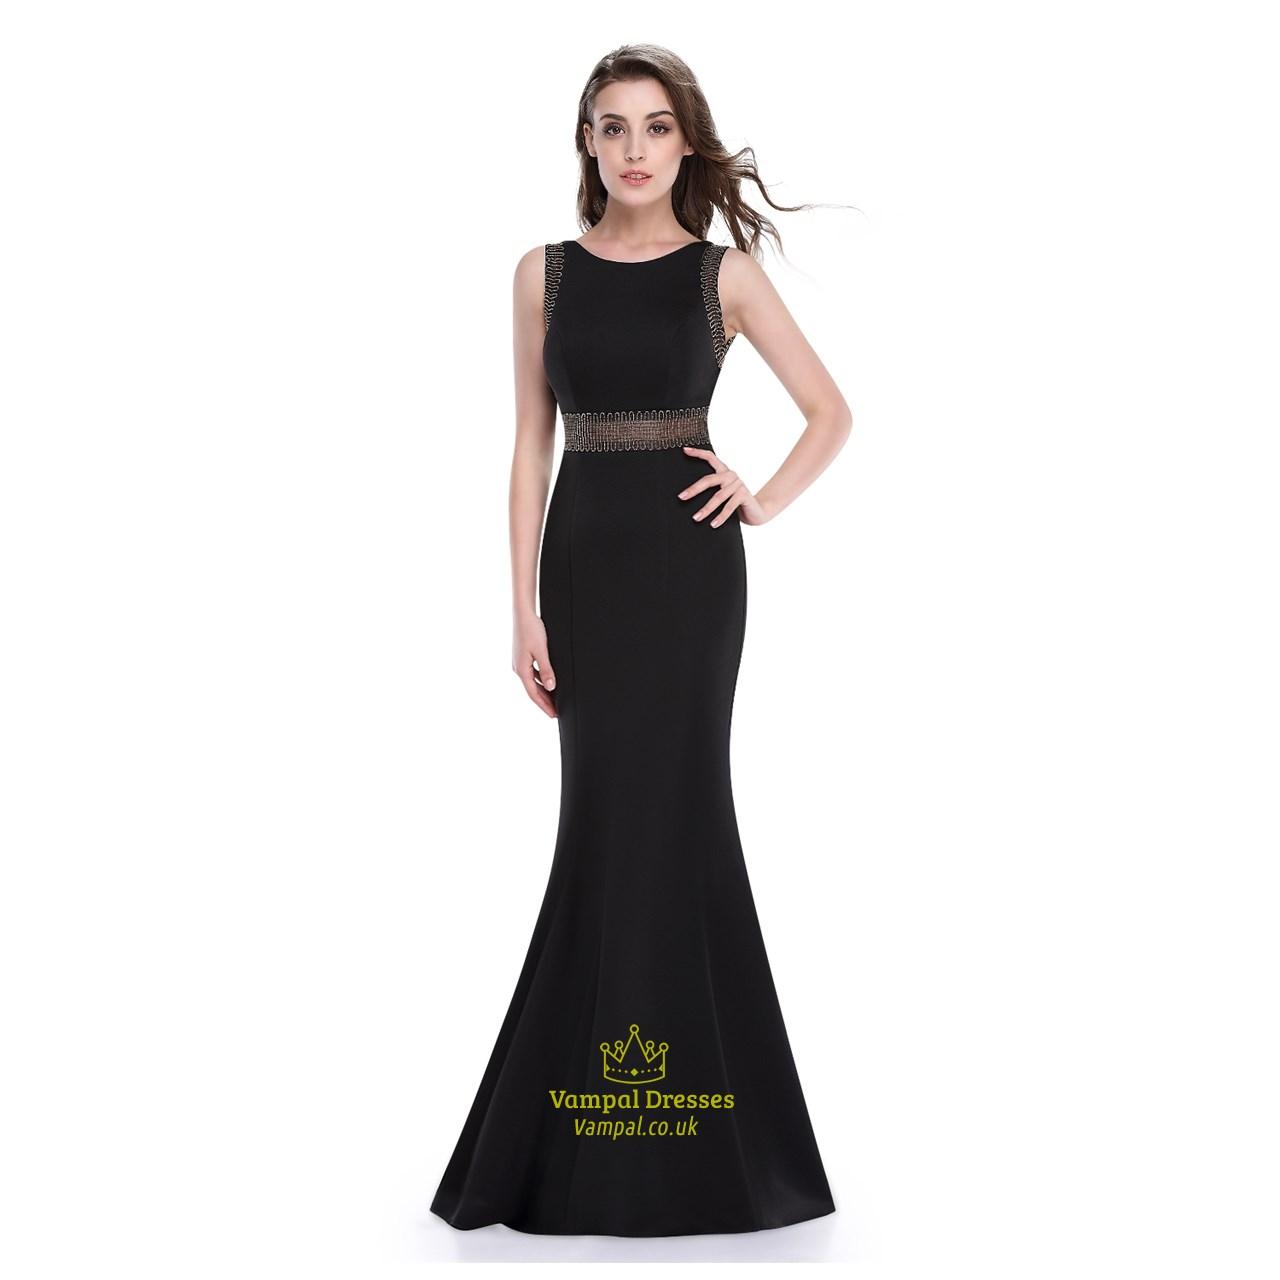 300c1ac34cde Black Mermaid Floor Length Sleeveless Prom Dress With Illusion Bodice SKU  -AP065